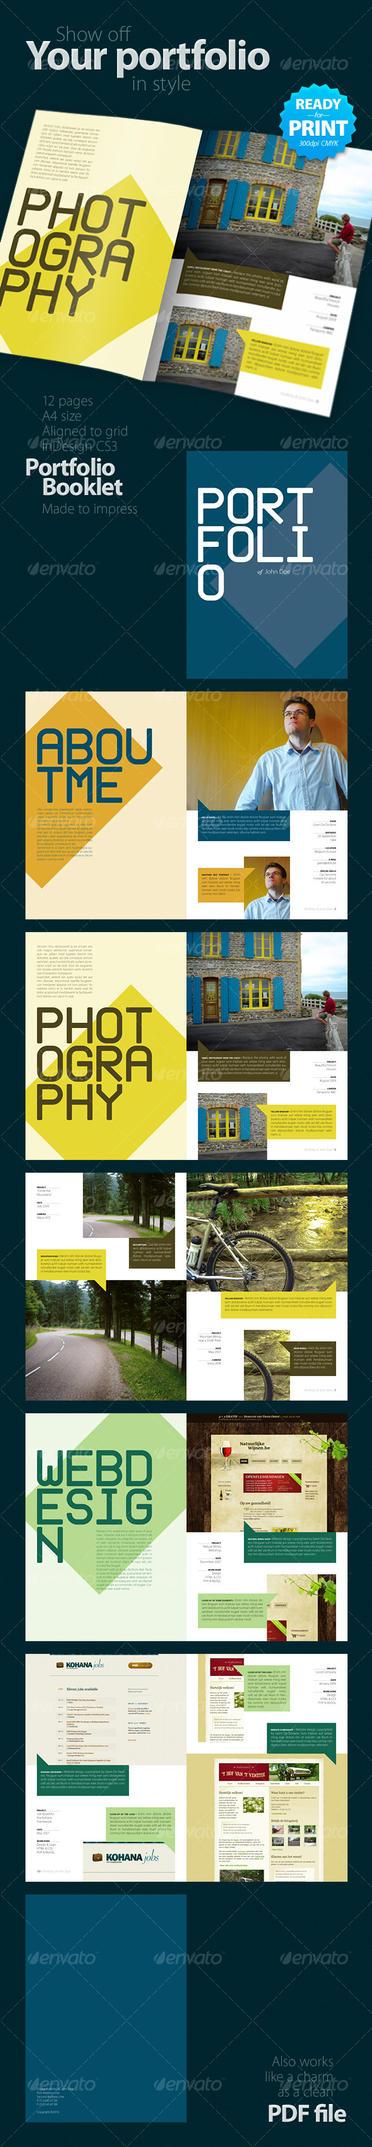 Portfolio Booklet Template by InDesign-Templates on DeviantArt